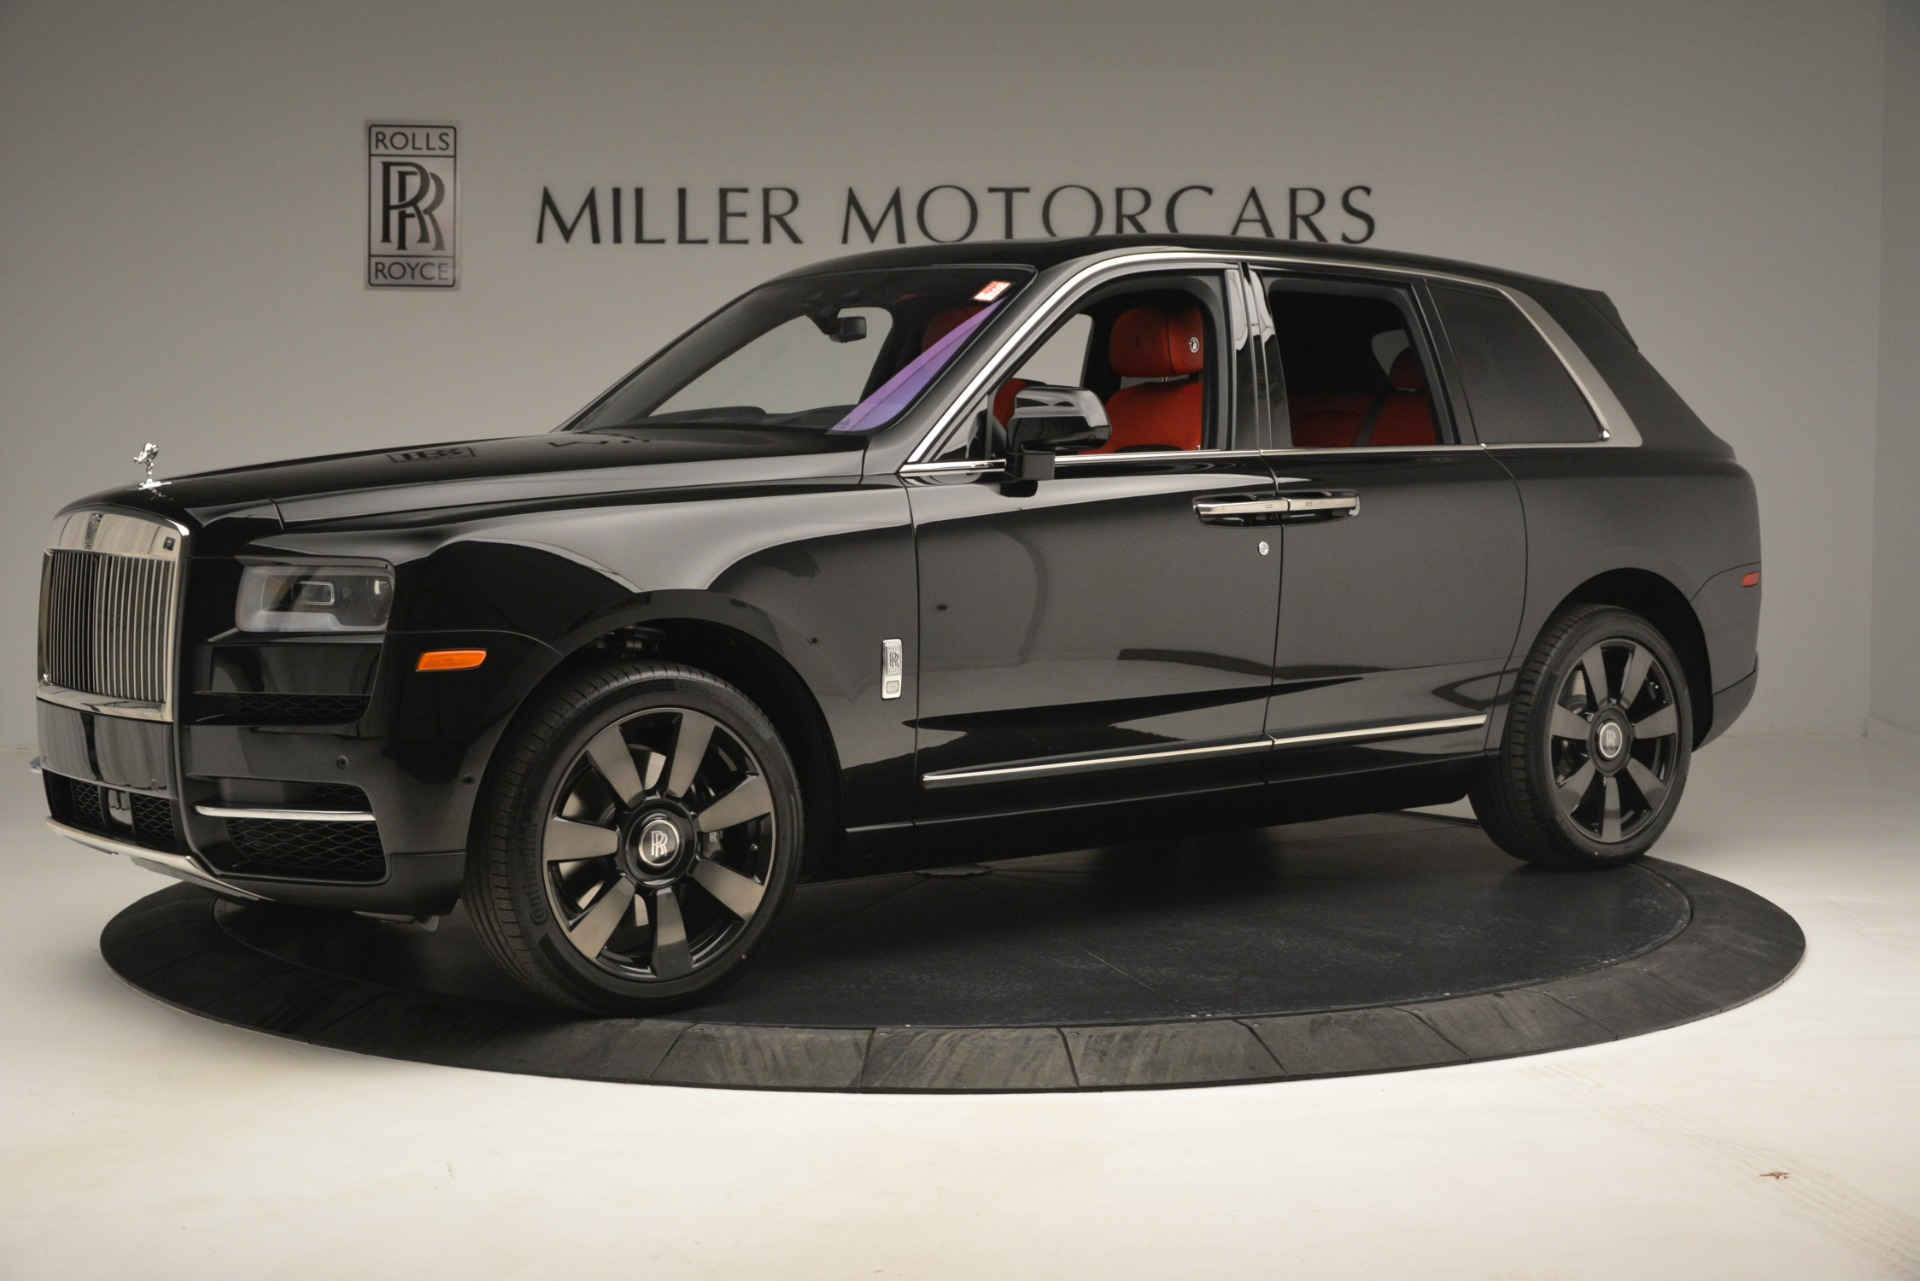 New 2019 Rolls-Royce Cullinan  For Sale In Greenwich, CT 2852_p3